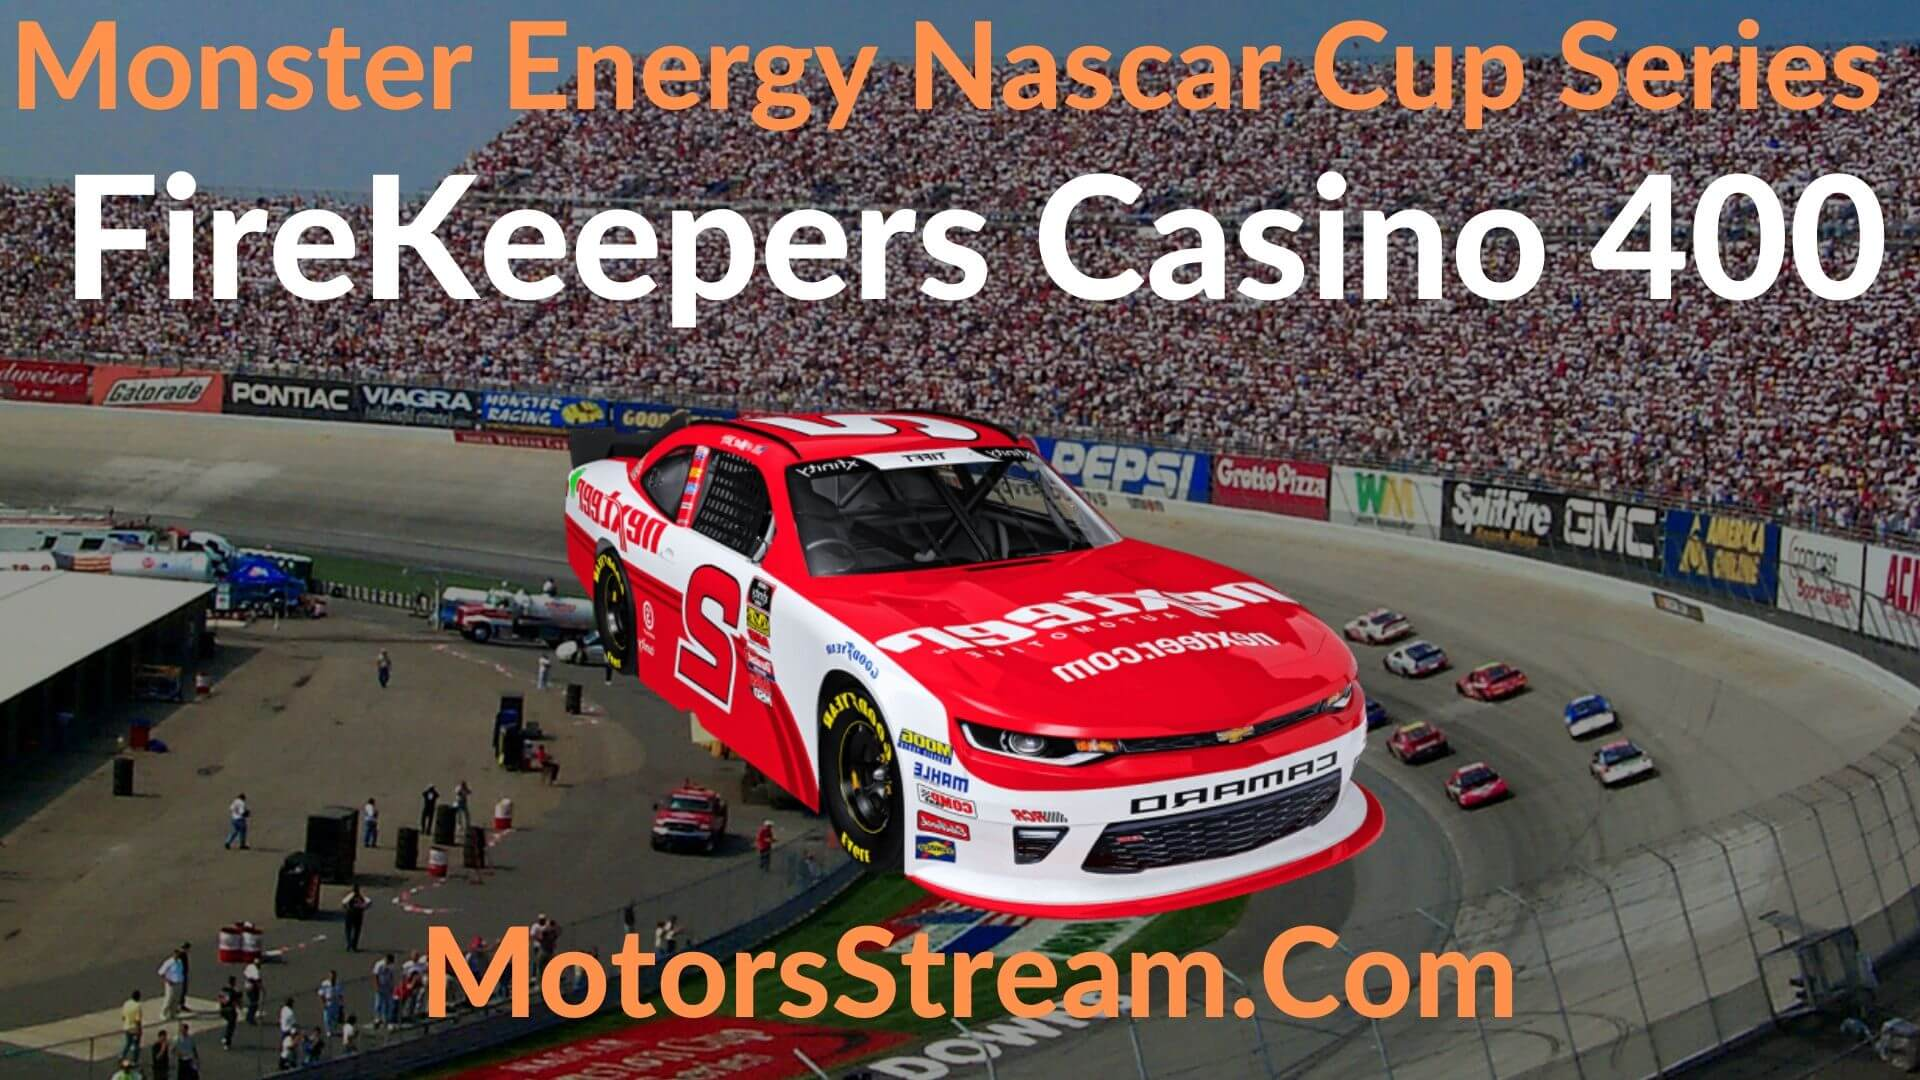 FireKeepers Casino 400 Live Stream   NASCAR CUP 2020